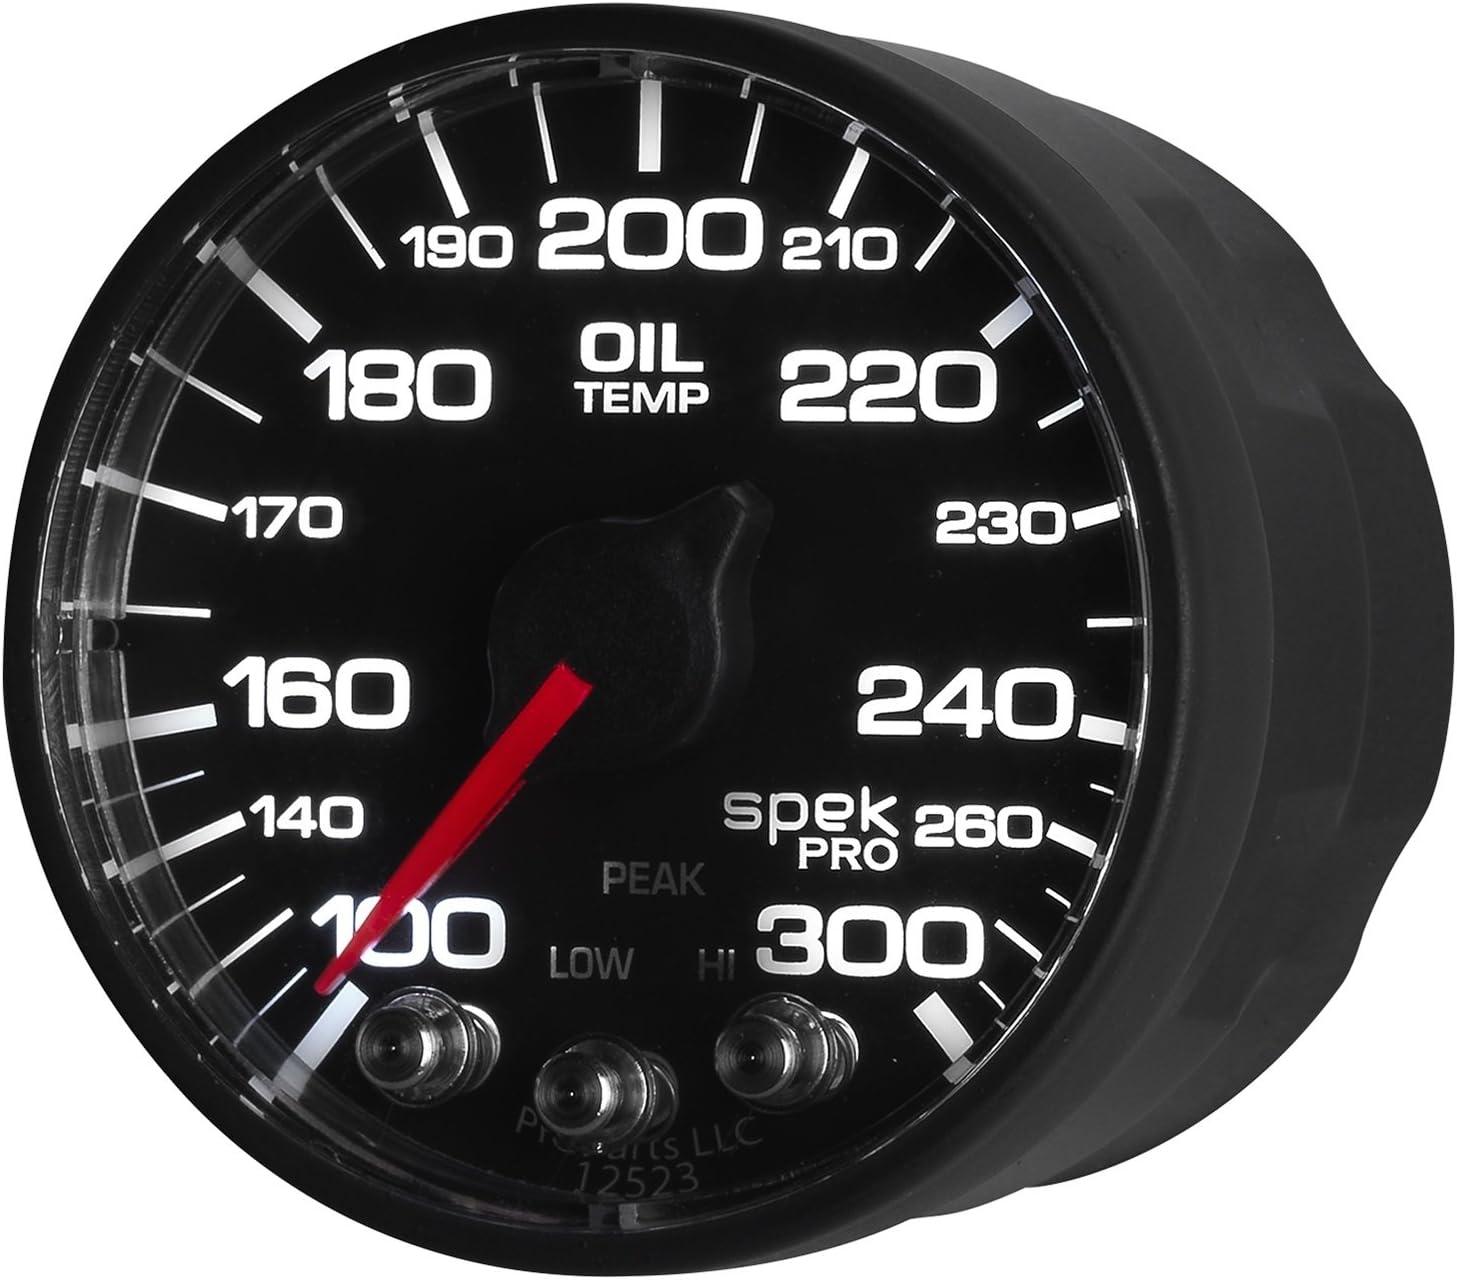 AUTO METER P522328 Pro-Nascar 2-1//16 Oil Temp ECU 100-300`F Spek BFB